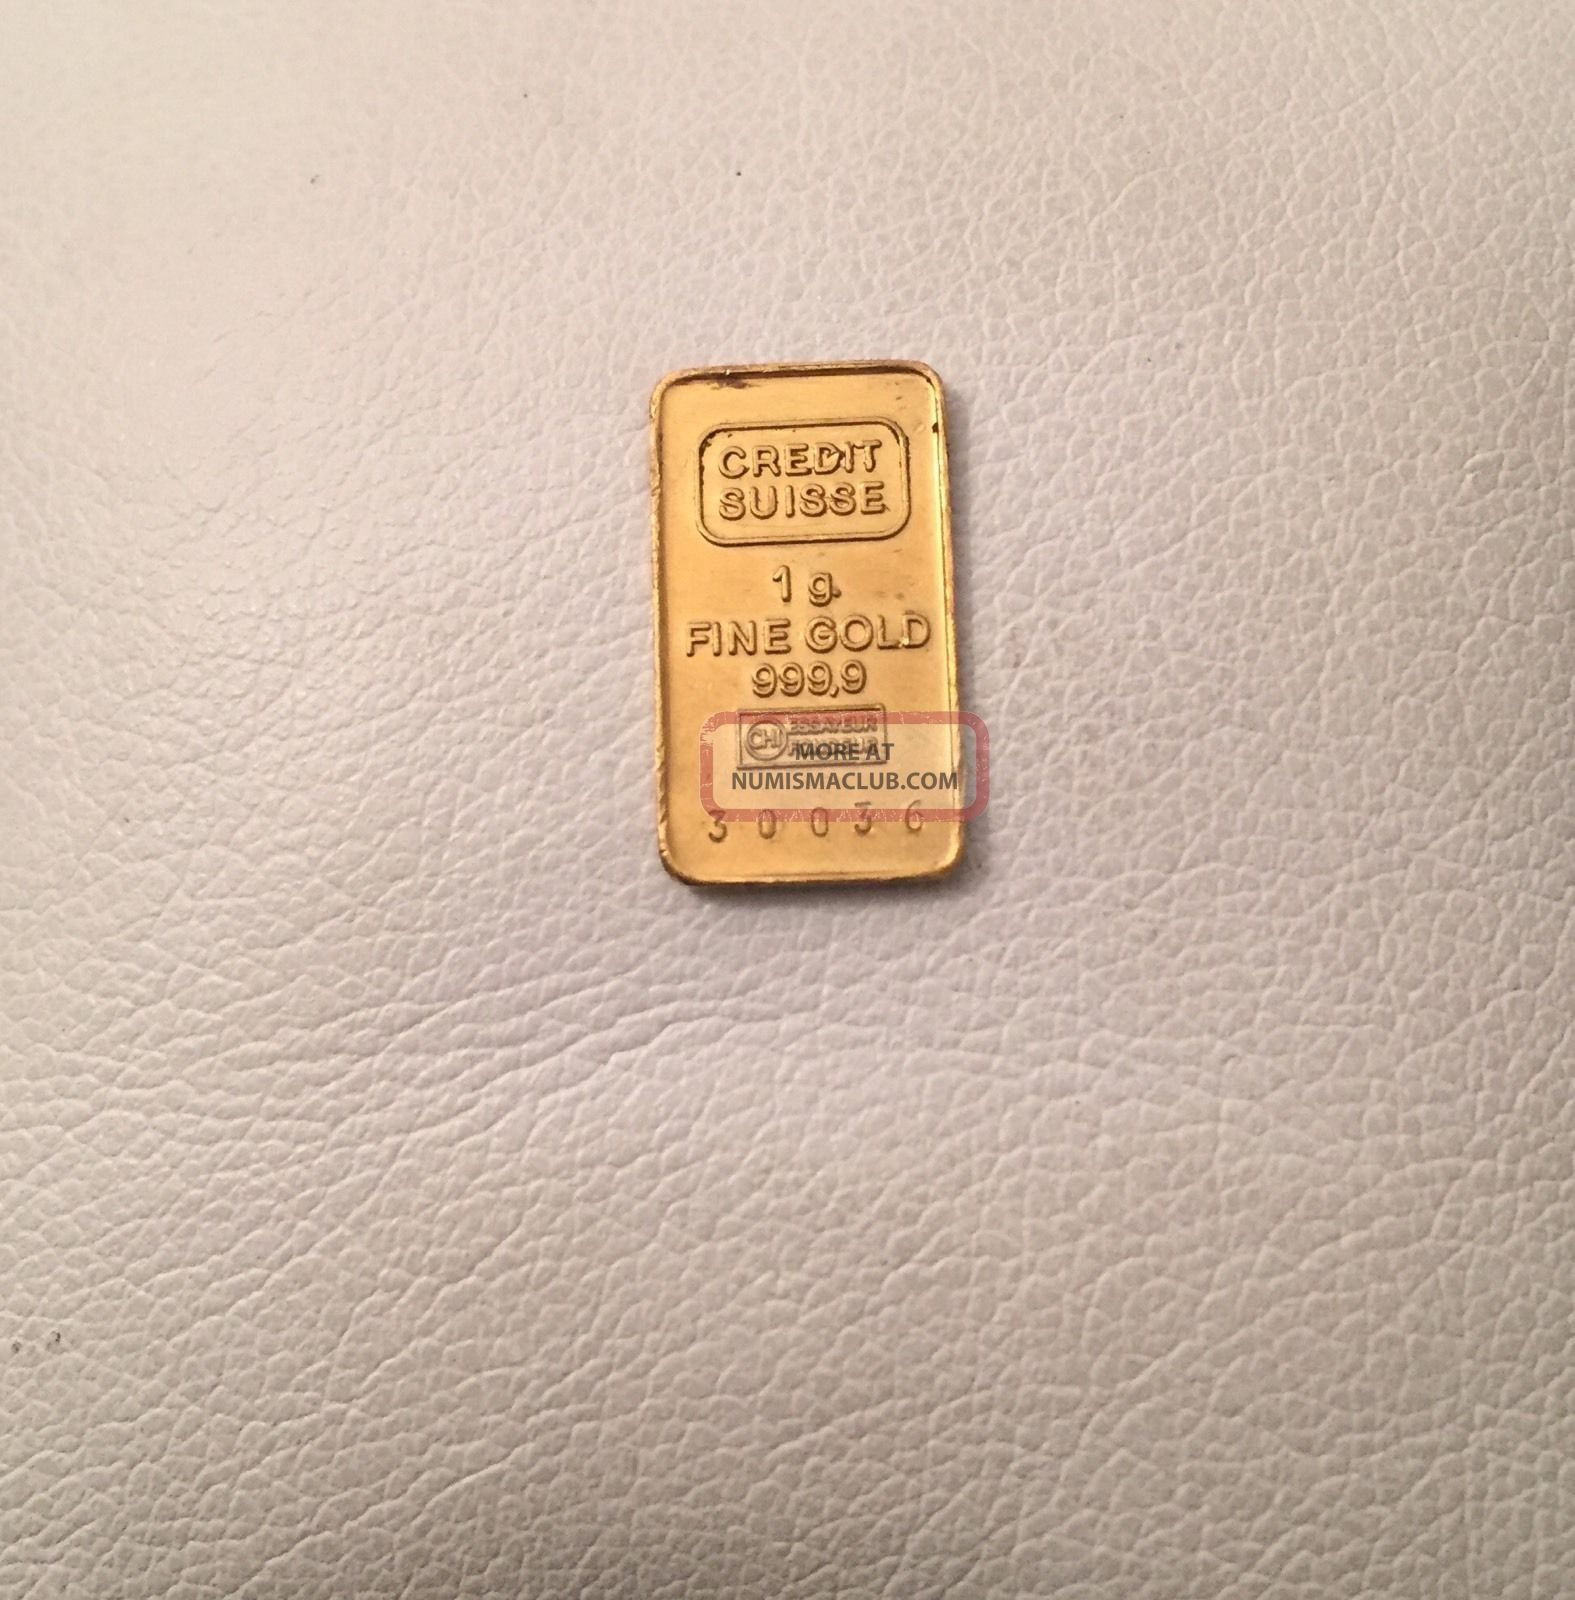 credit suisse fine gold essayeur fondeur Results 1 - 48 of 48  credit suisse one ounce fine silver 999,0 chi essayeur fondeur bar  1 oz  credit suisse gold bar in assay 9999 fine - sku #82687.